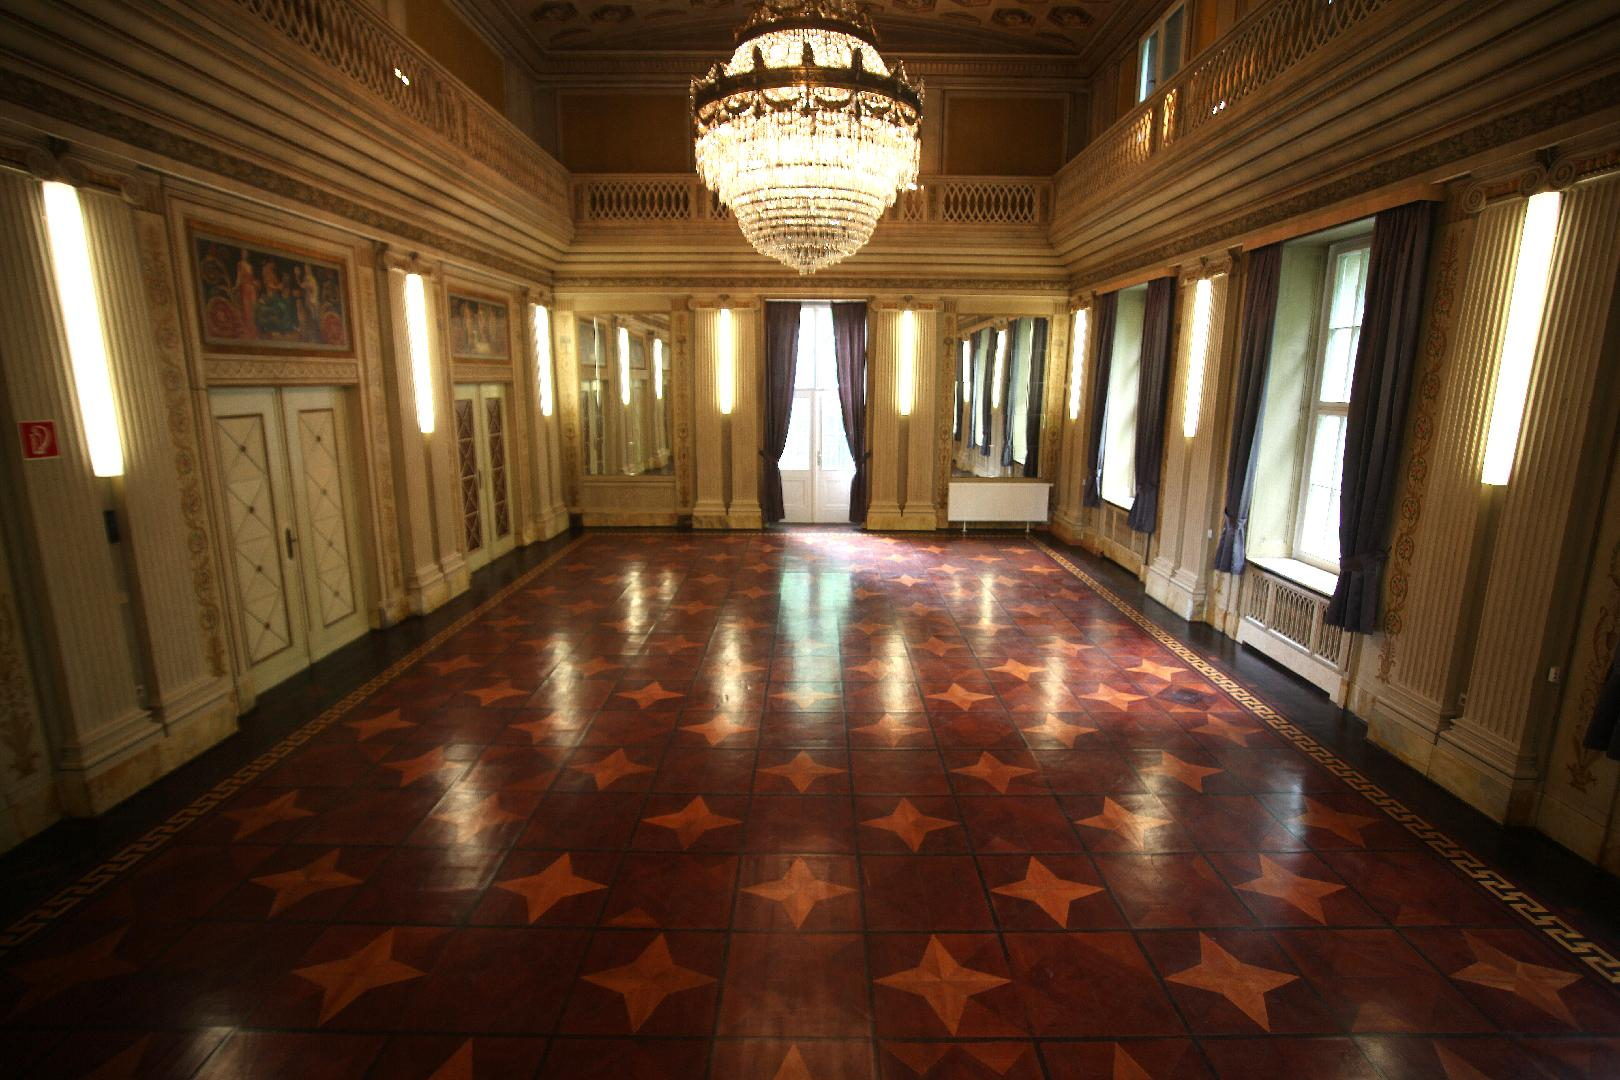 Villa1910 - Schloss-Saal mit Bankett